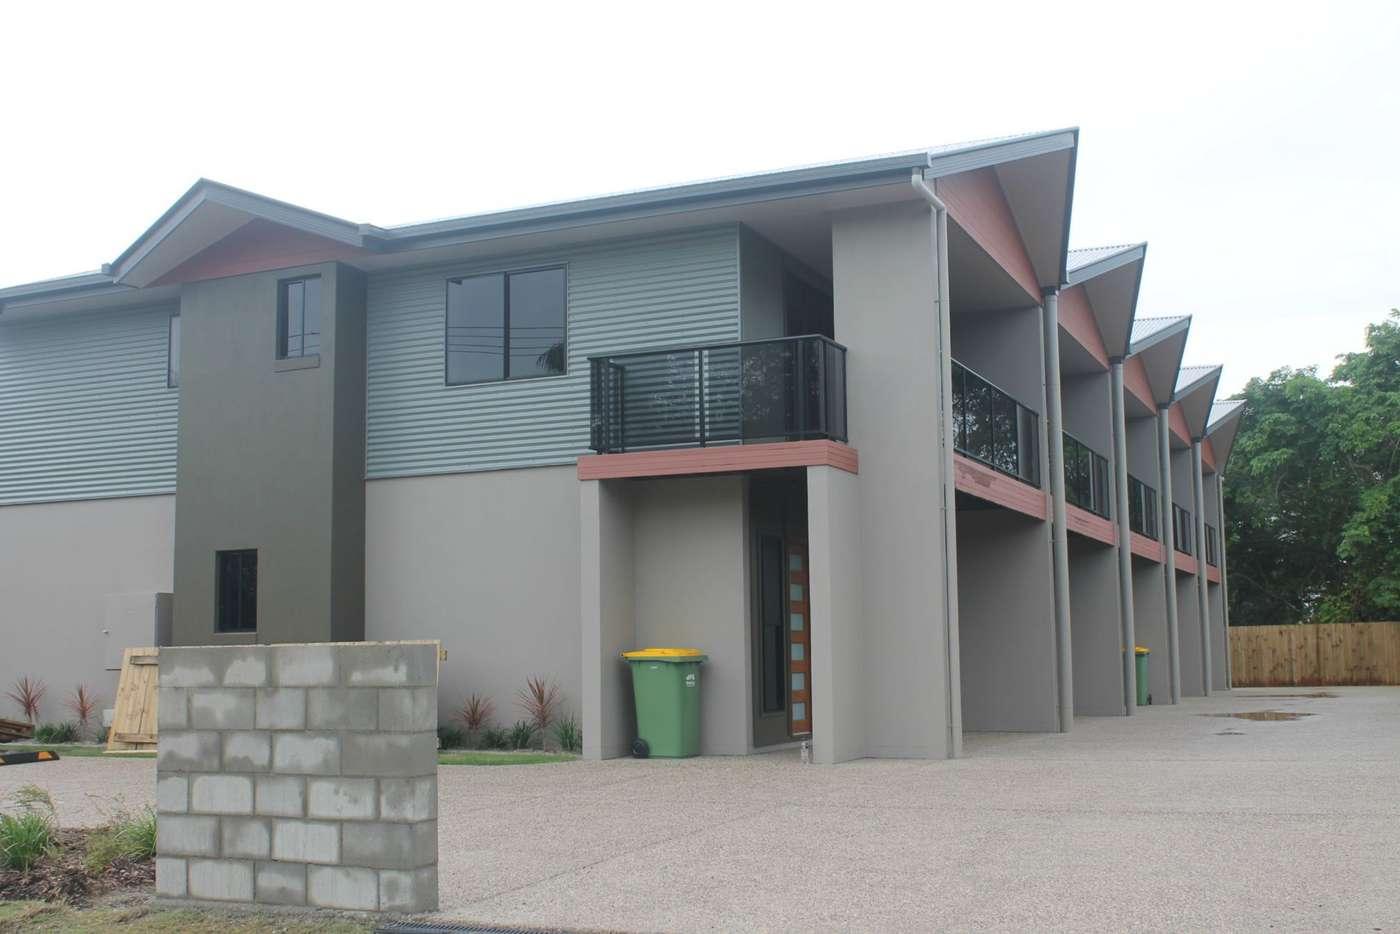 Main view of Homely unit listing, 5/24 East Gordon Street, Mackay QLD 4740